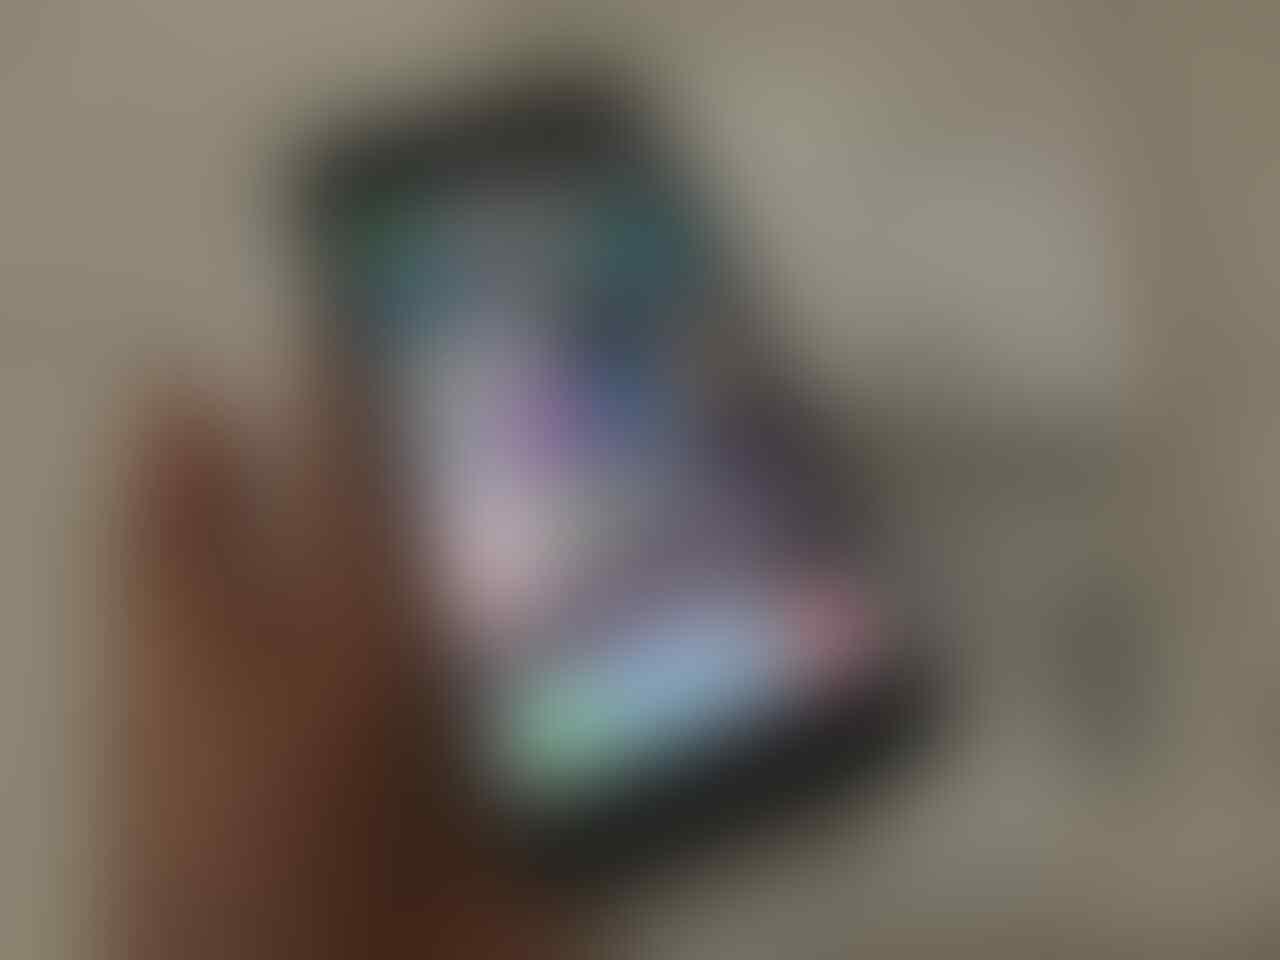 IPHONE 6 PLUS GREY 64GB IOS 8 FU FULLSET MULUUSS NORMAL MURAAHH 4350 SAJA [MALANG]